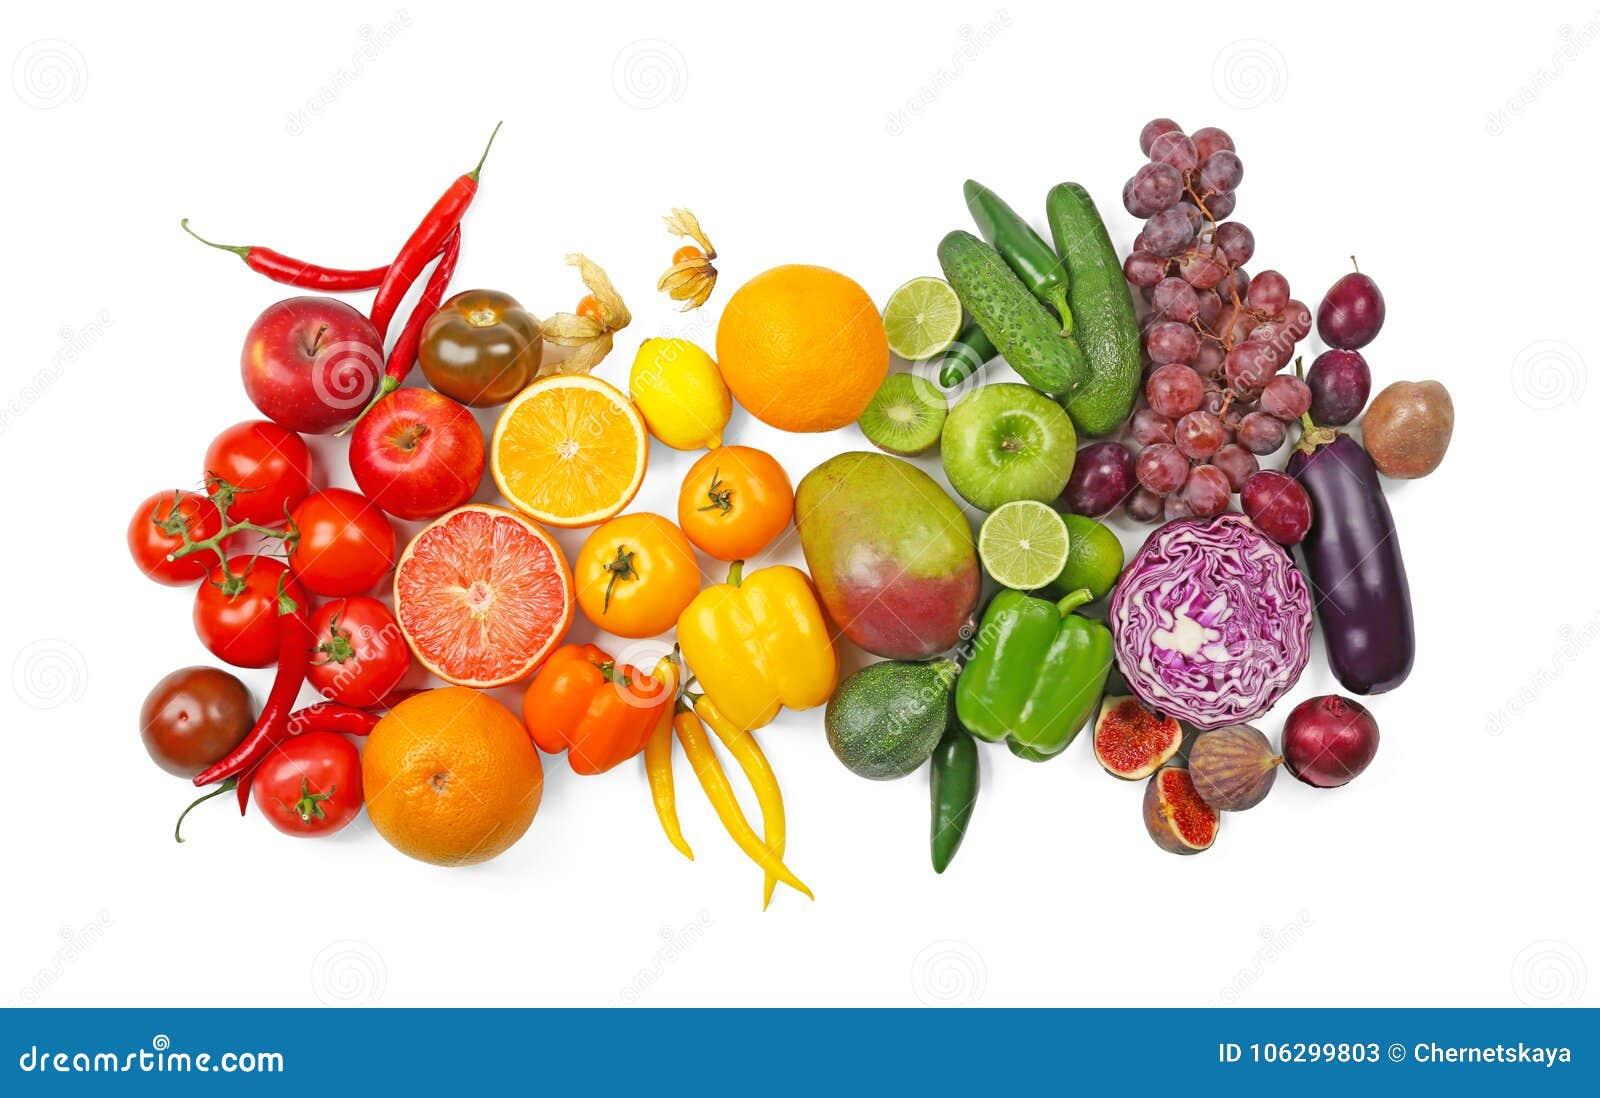 Vele verschillende vruchten en groenten